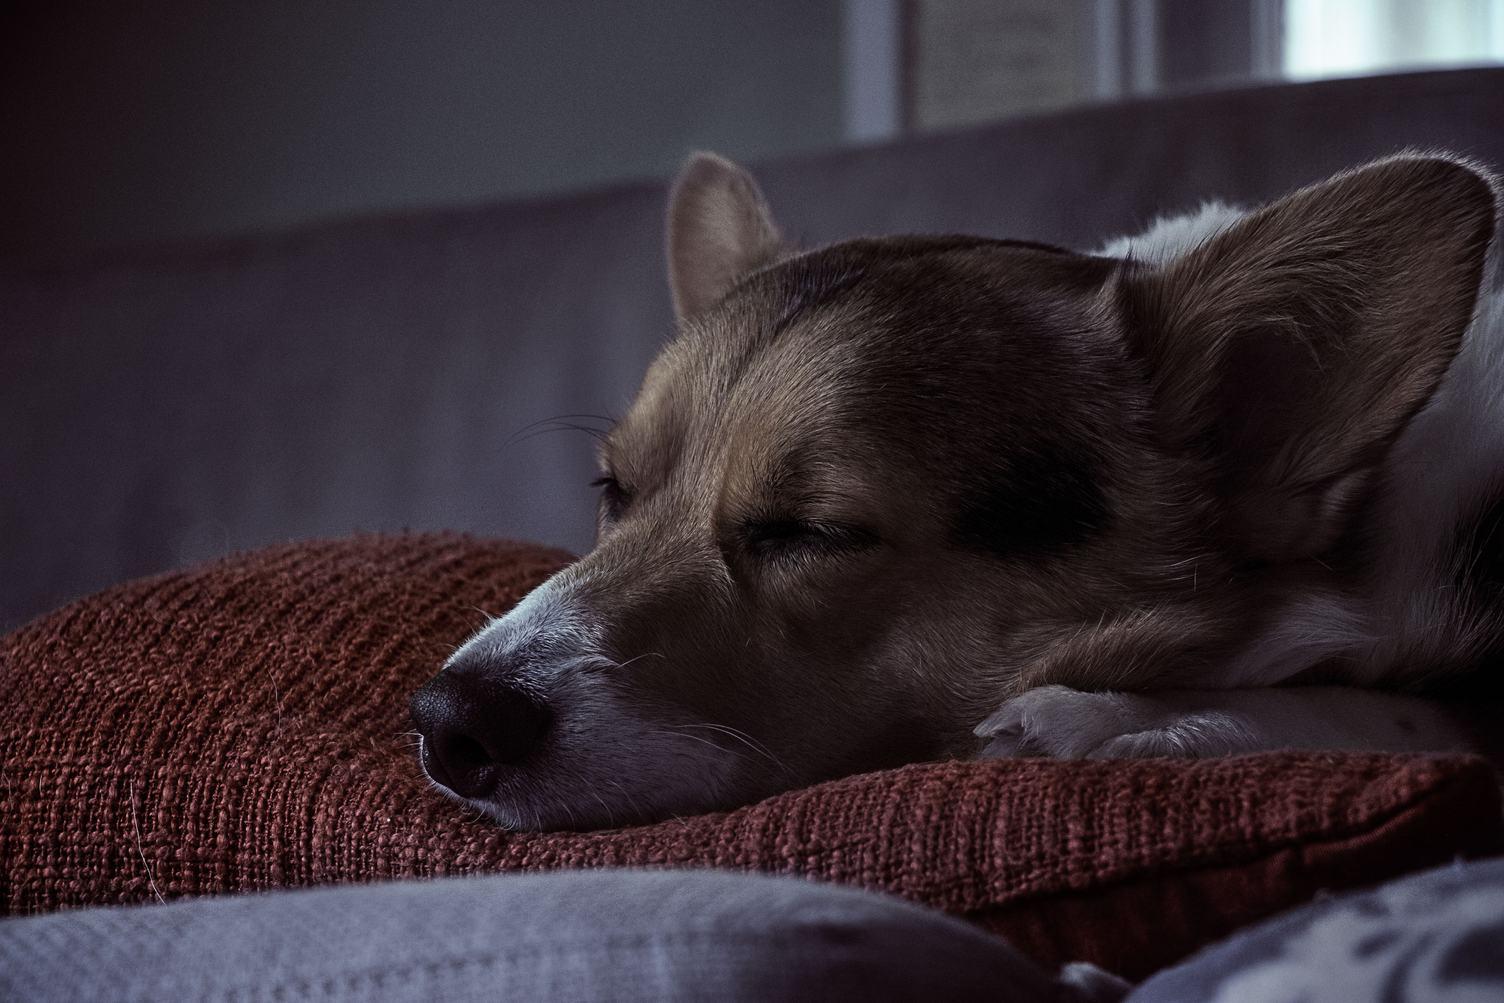 Dog Sleeping on the Pillow